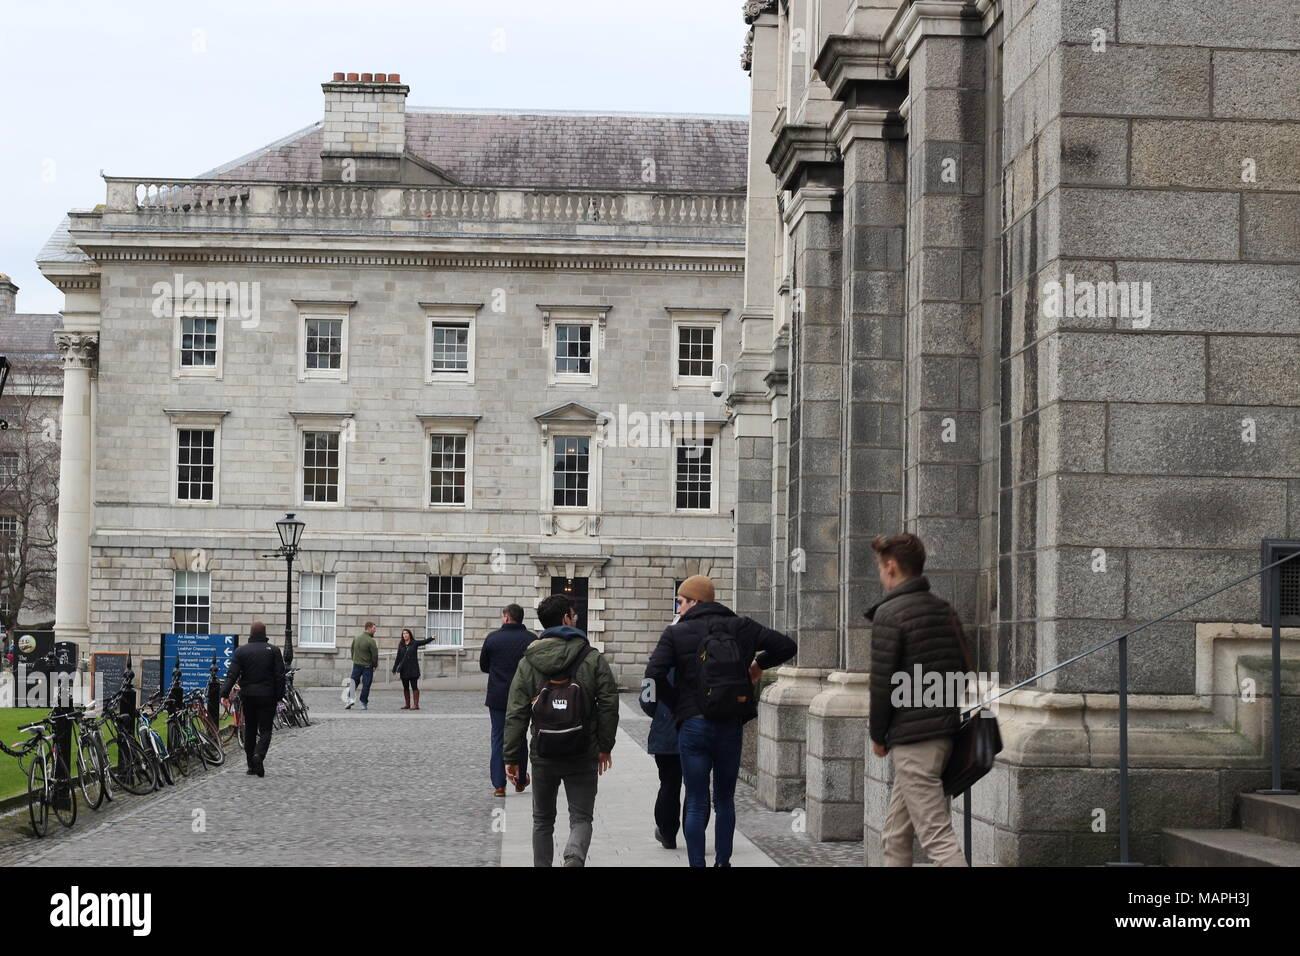 students gathering around trinity university college in Dublin Ireland. - Stock Image